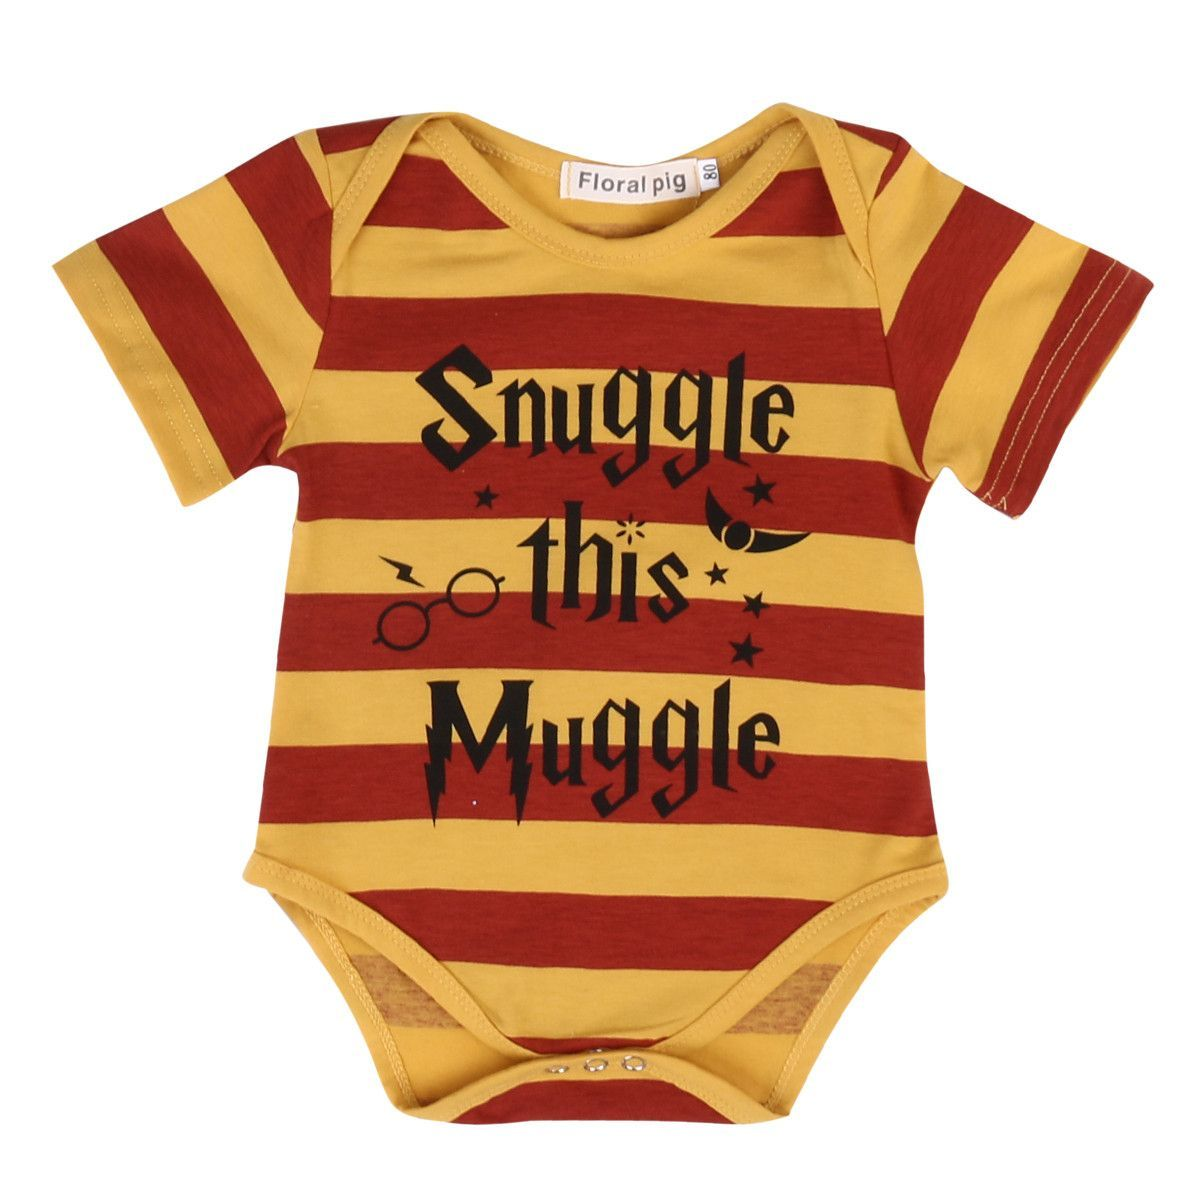 Snuggle This Muggle Harry Potter Gryffindor House Babygrow Playsuit Infant Baby